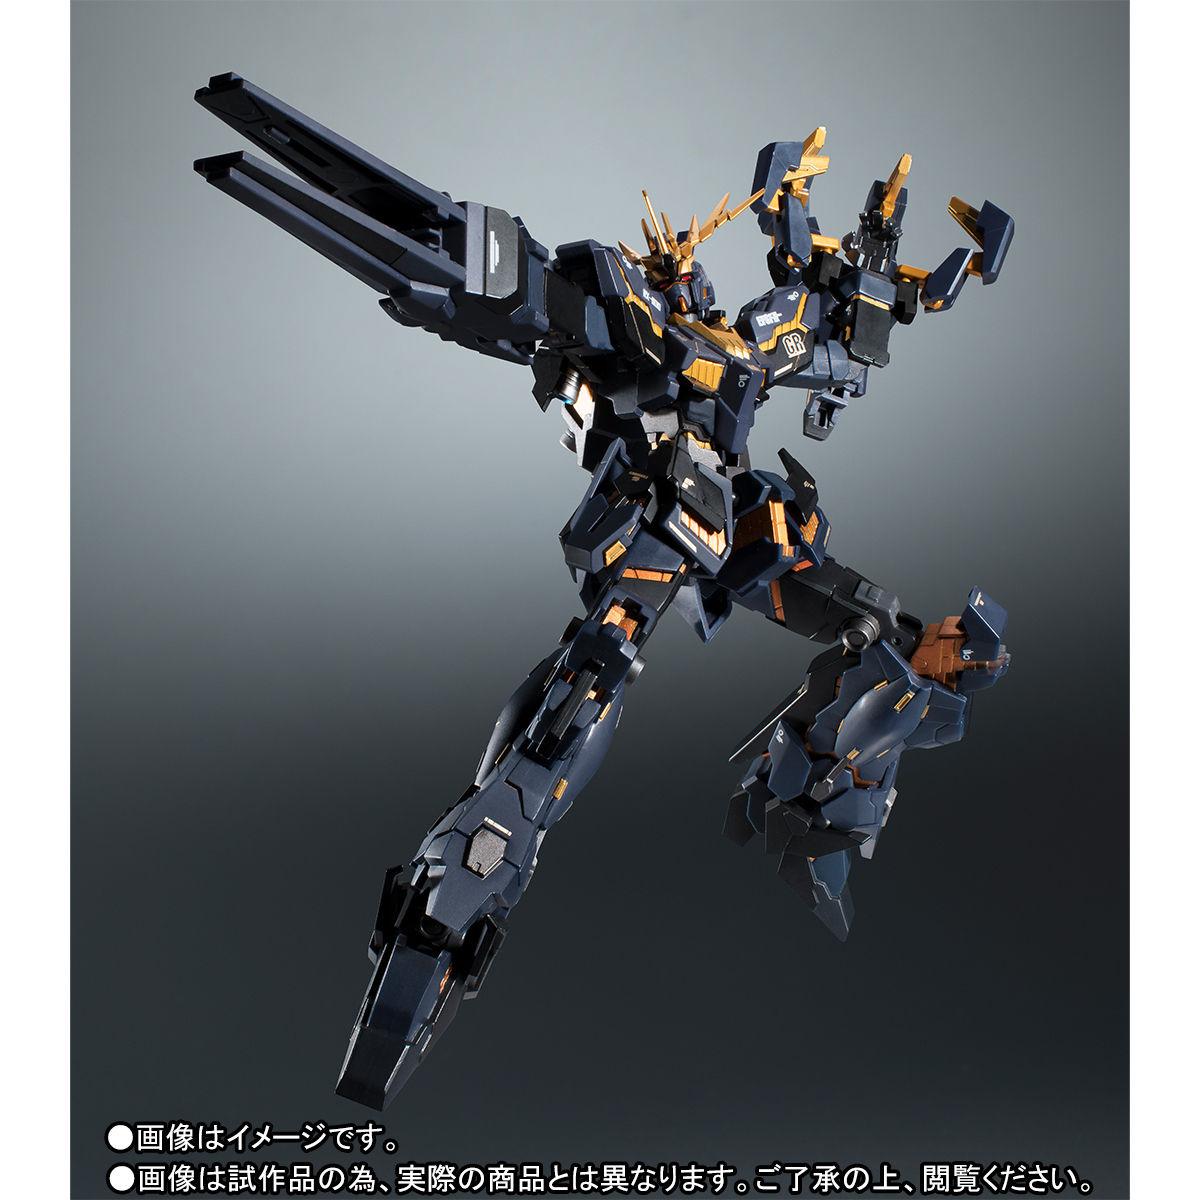 ROBOT魂〈SIDE MS〉『バンシィ・ノルン SPパック リアルマーキングVer.』可動フィギュア-009